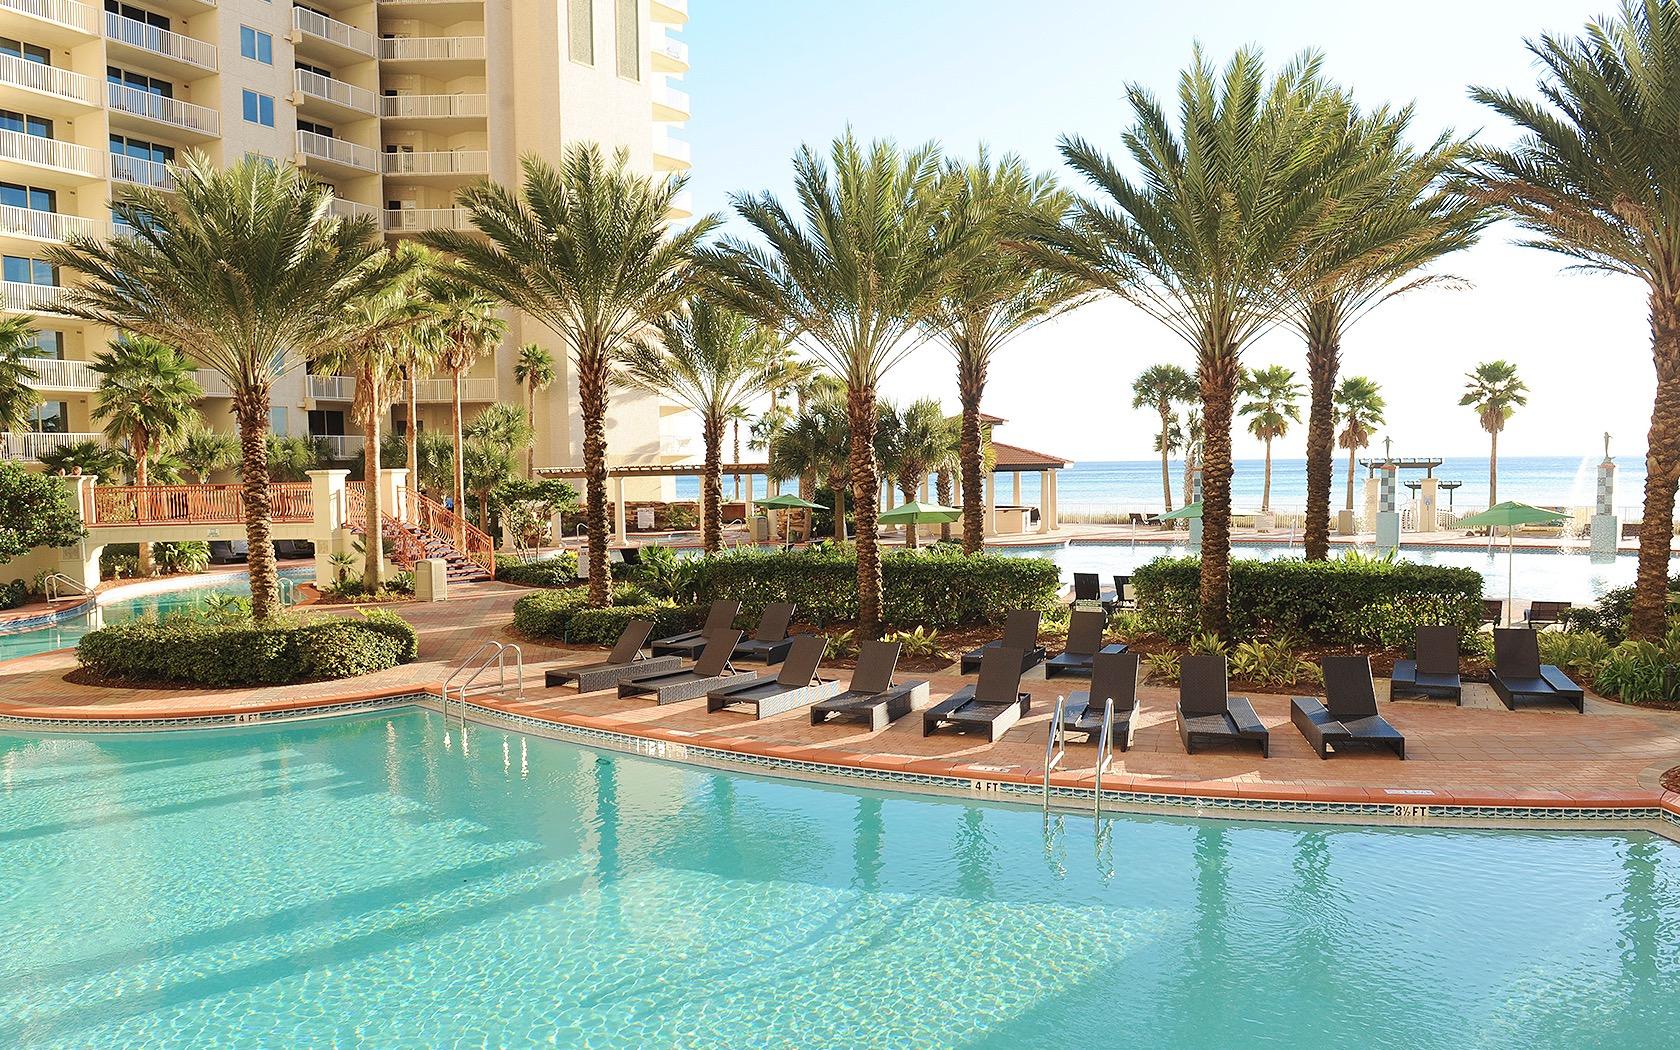 Gorgeous pool area at Shores of Panama Panama City Beach FL